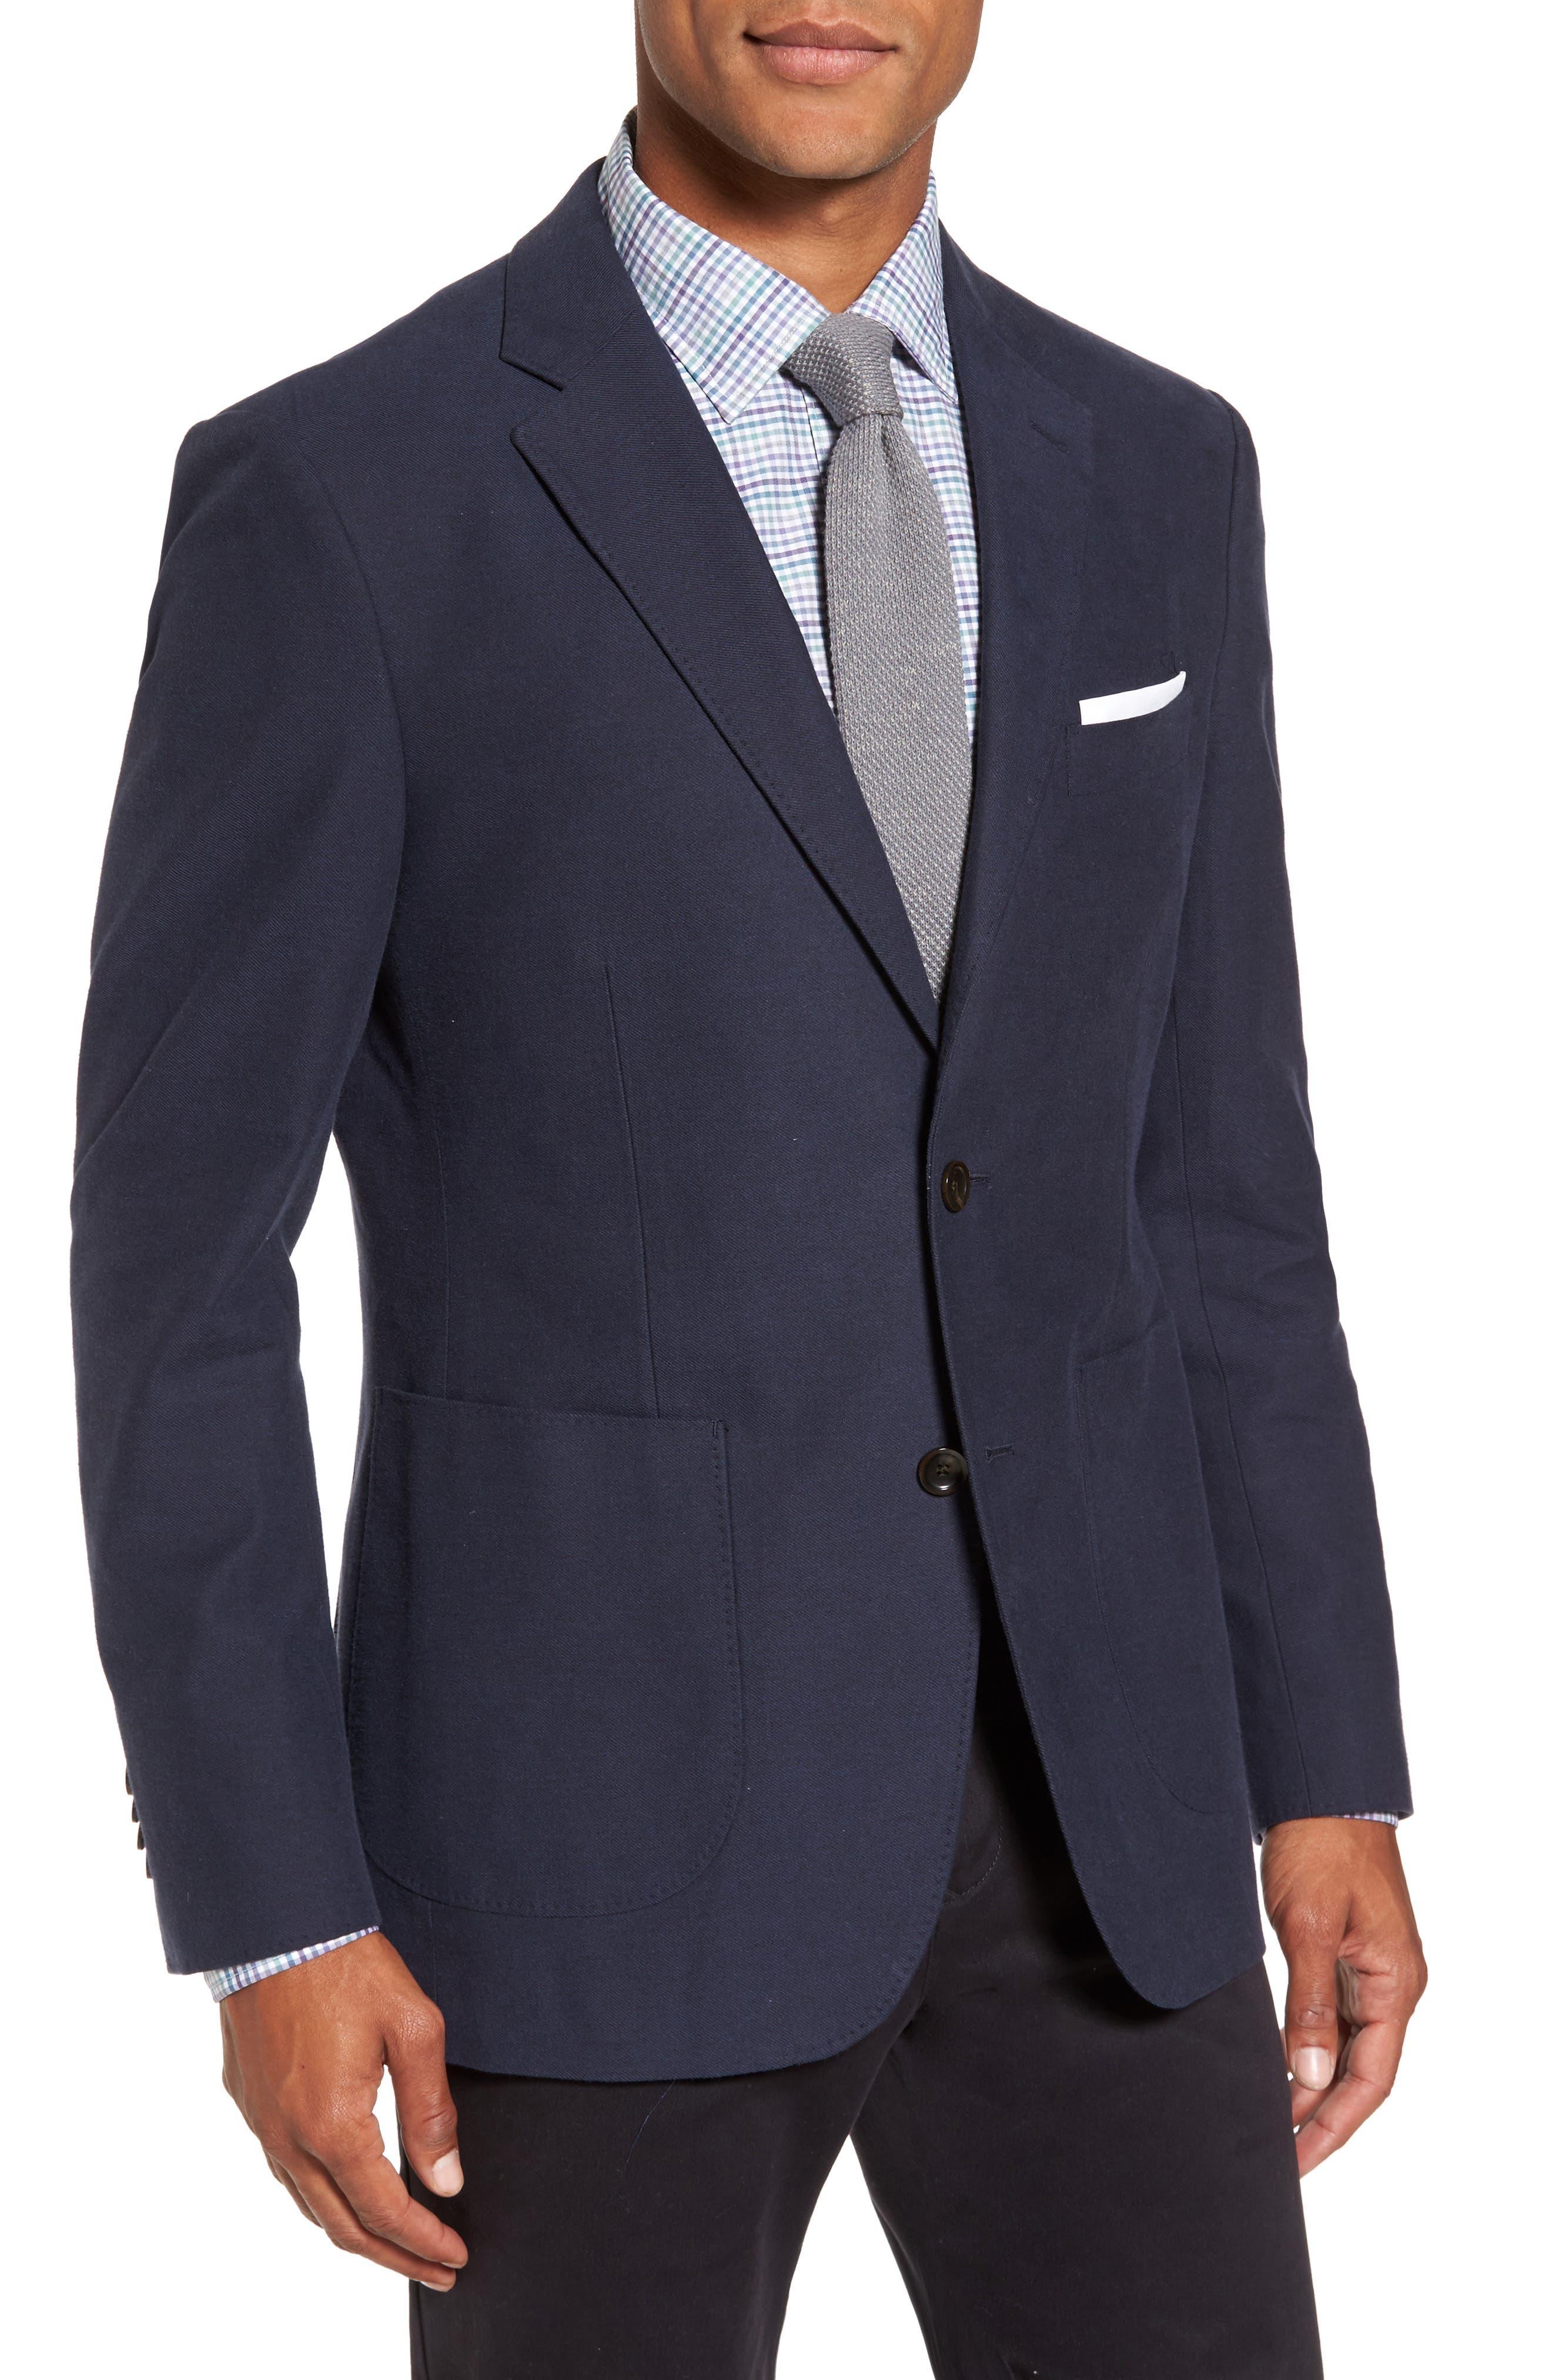 Pembroke Sports Fit Twill Jacket,                             Main thumbnail 1, color,                             410